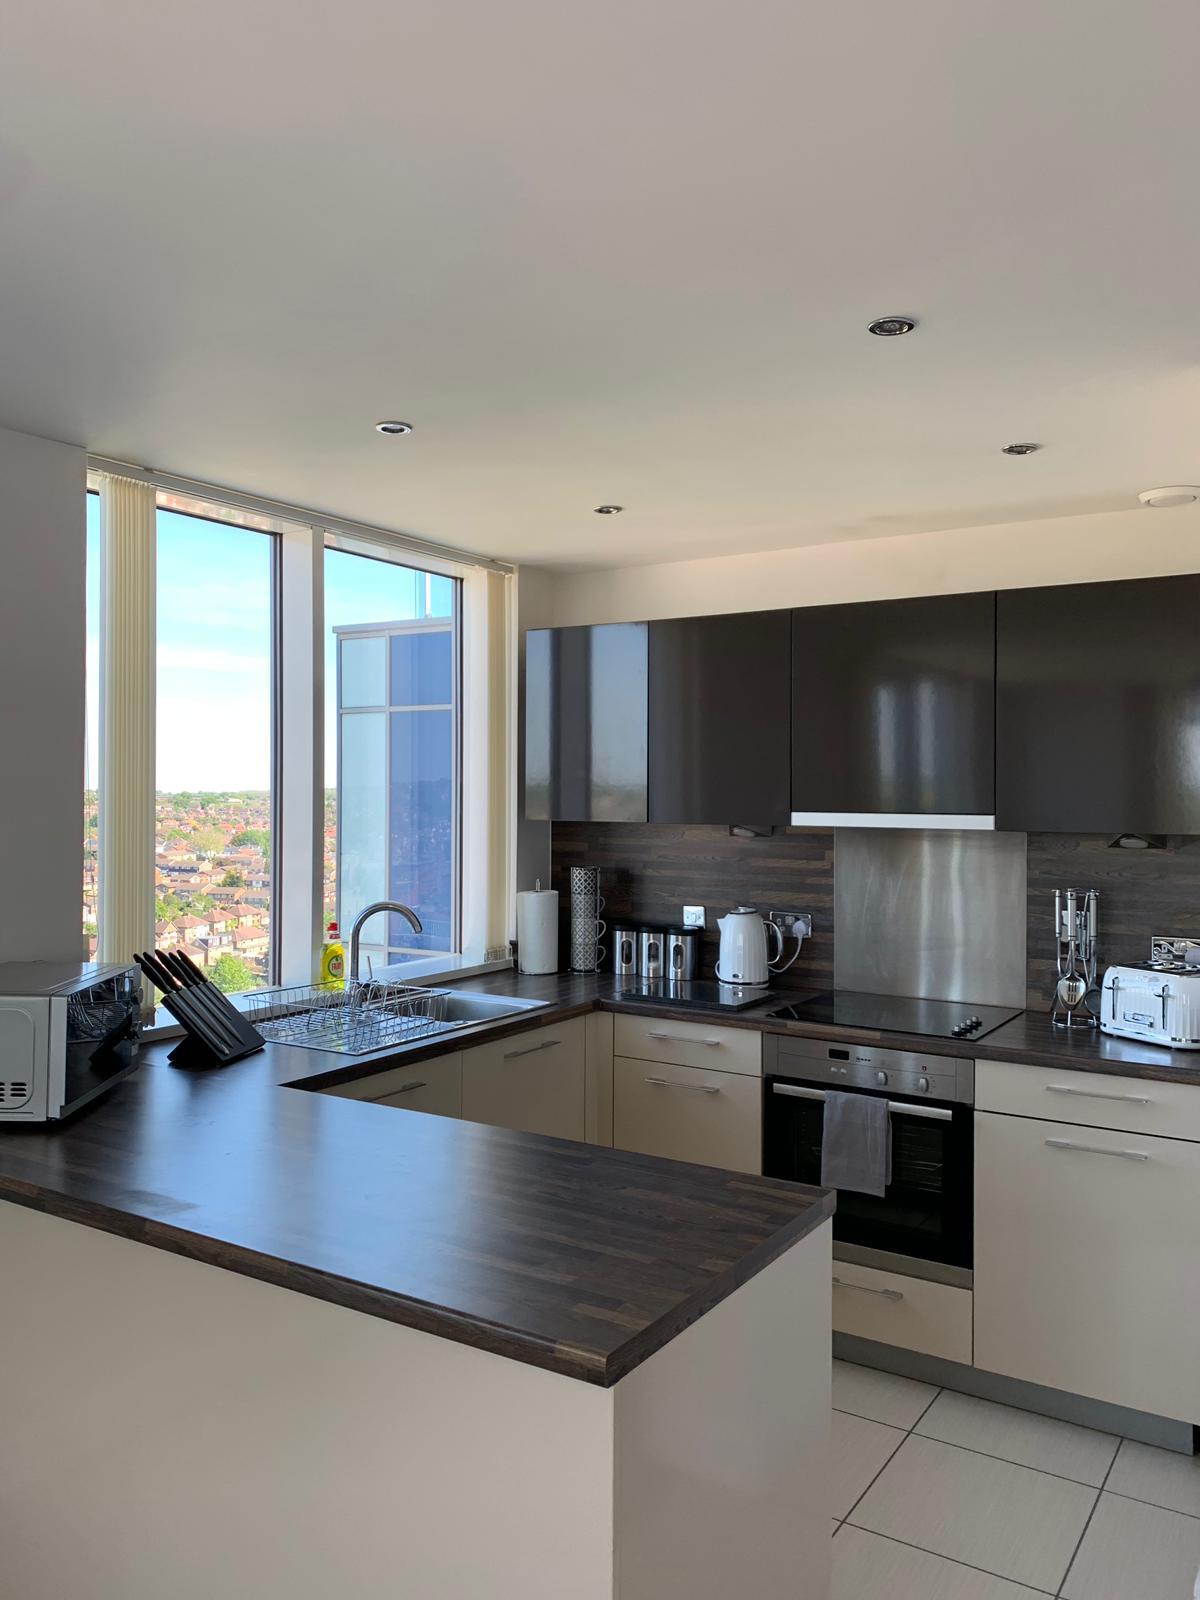 Kitchen facilities at KD Tower Serviced Apartments